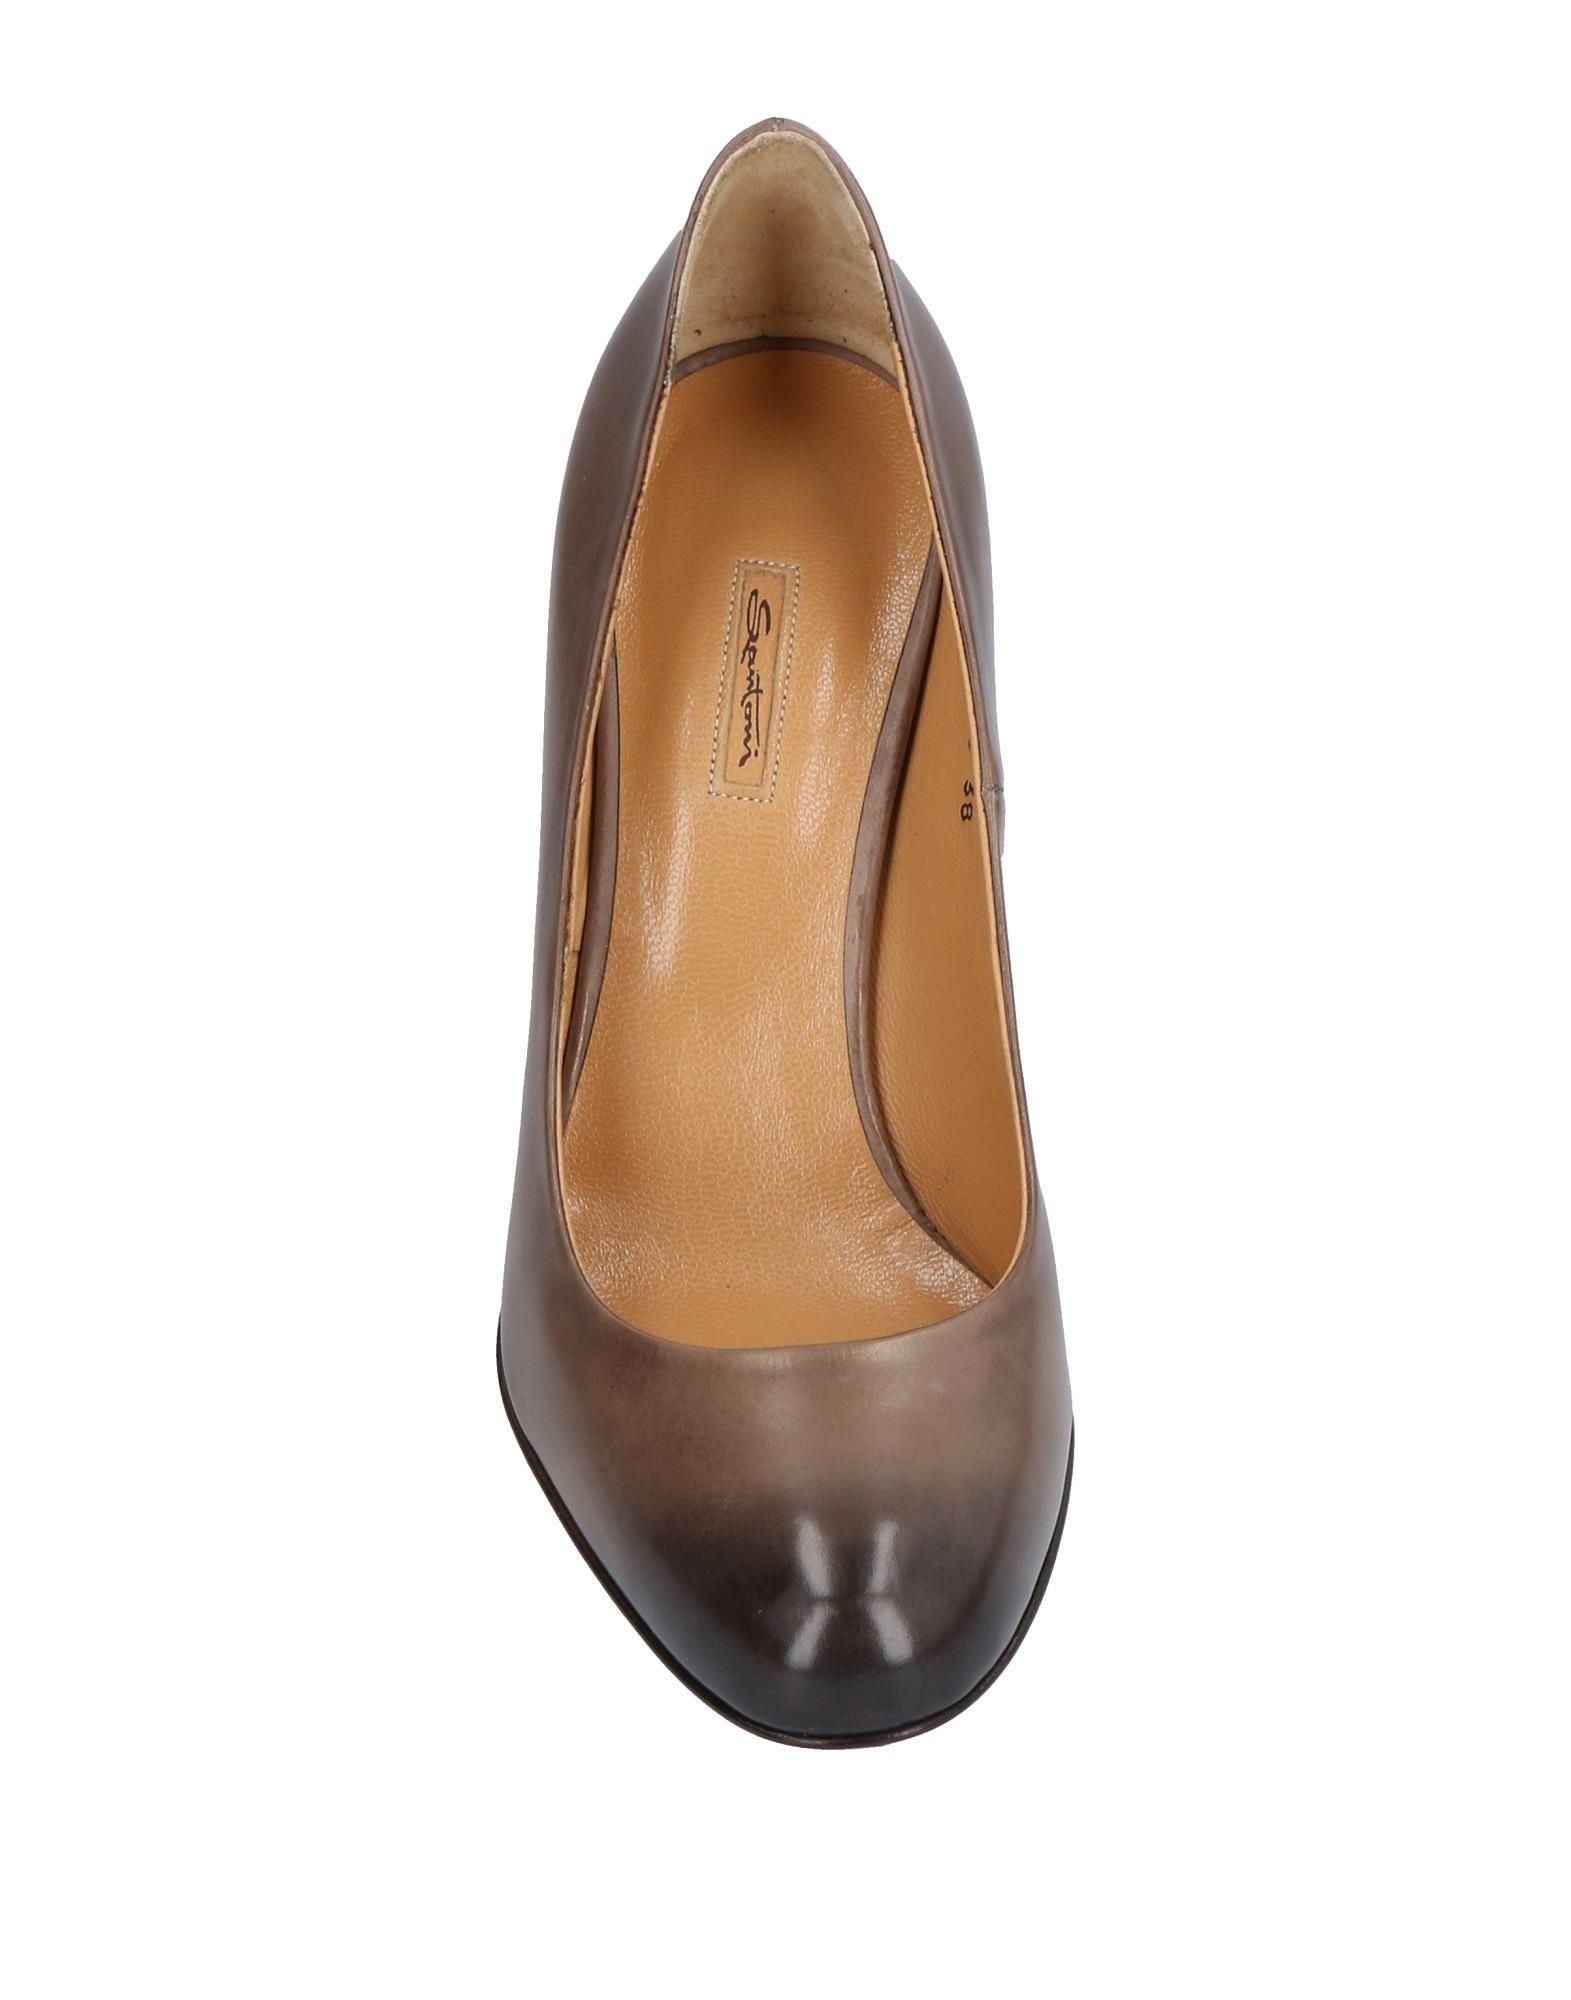 Santoni Pumps Damen  11513762IOGut Schuhe aussehende strapazierfähige Schuhe 11513762IOGut 56229a